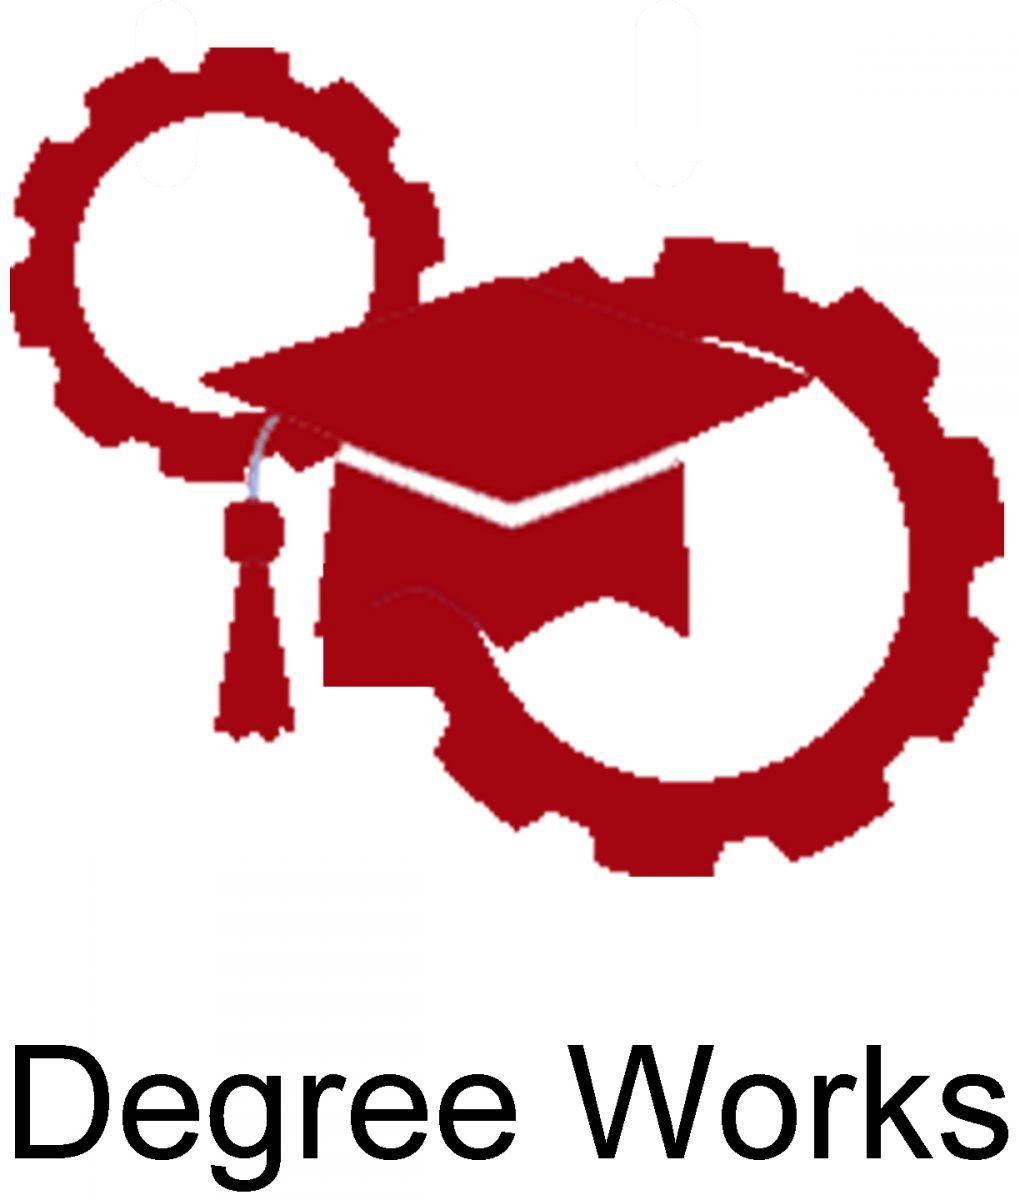 Degree Works